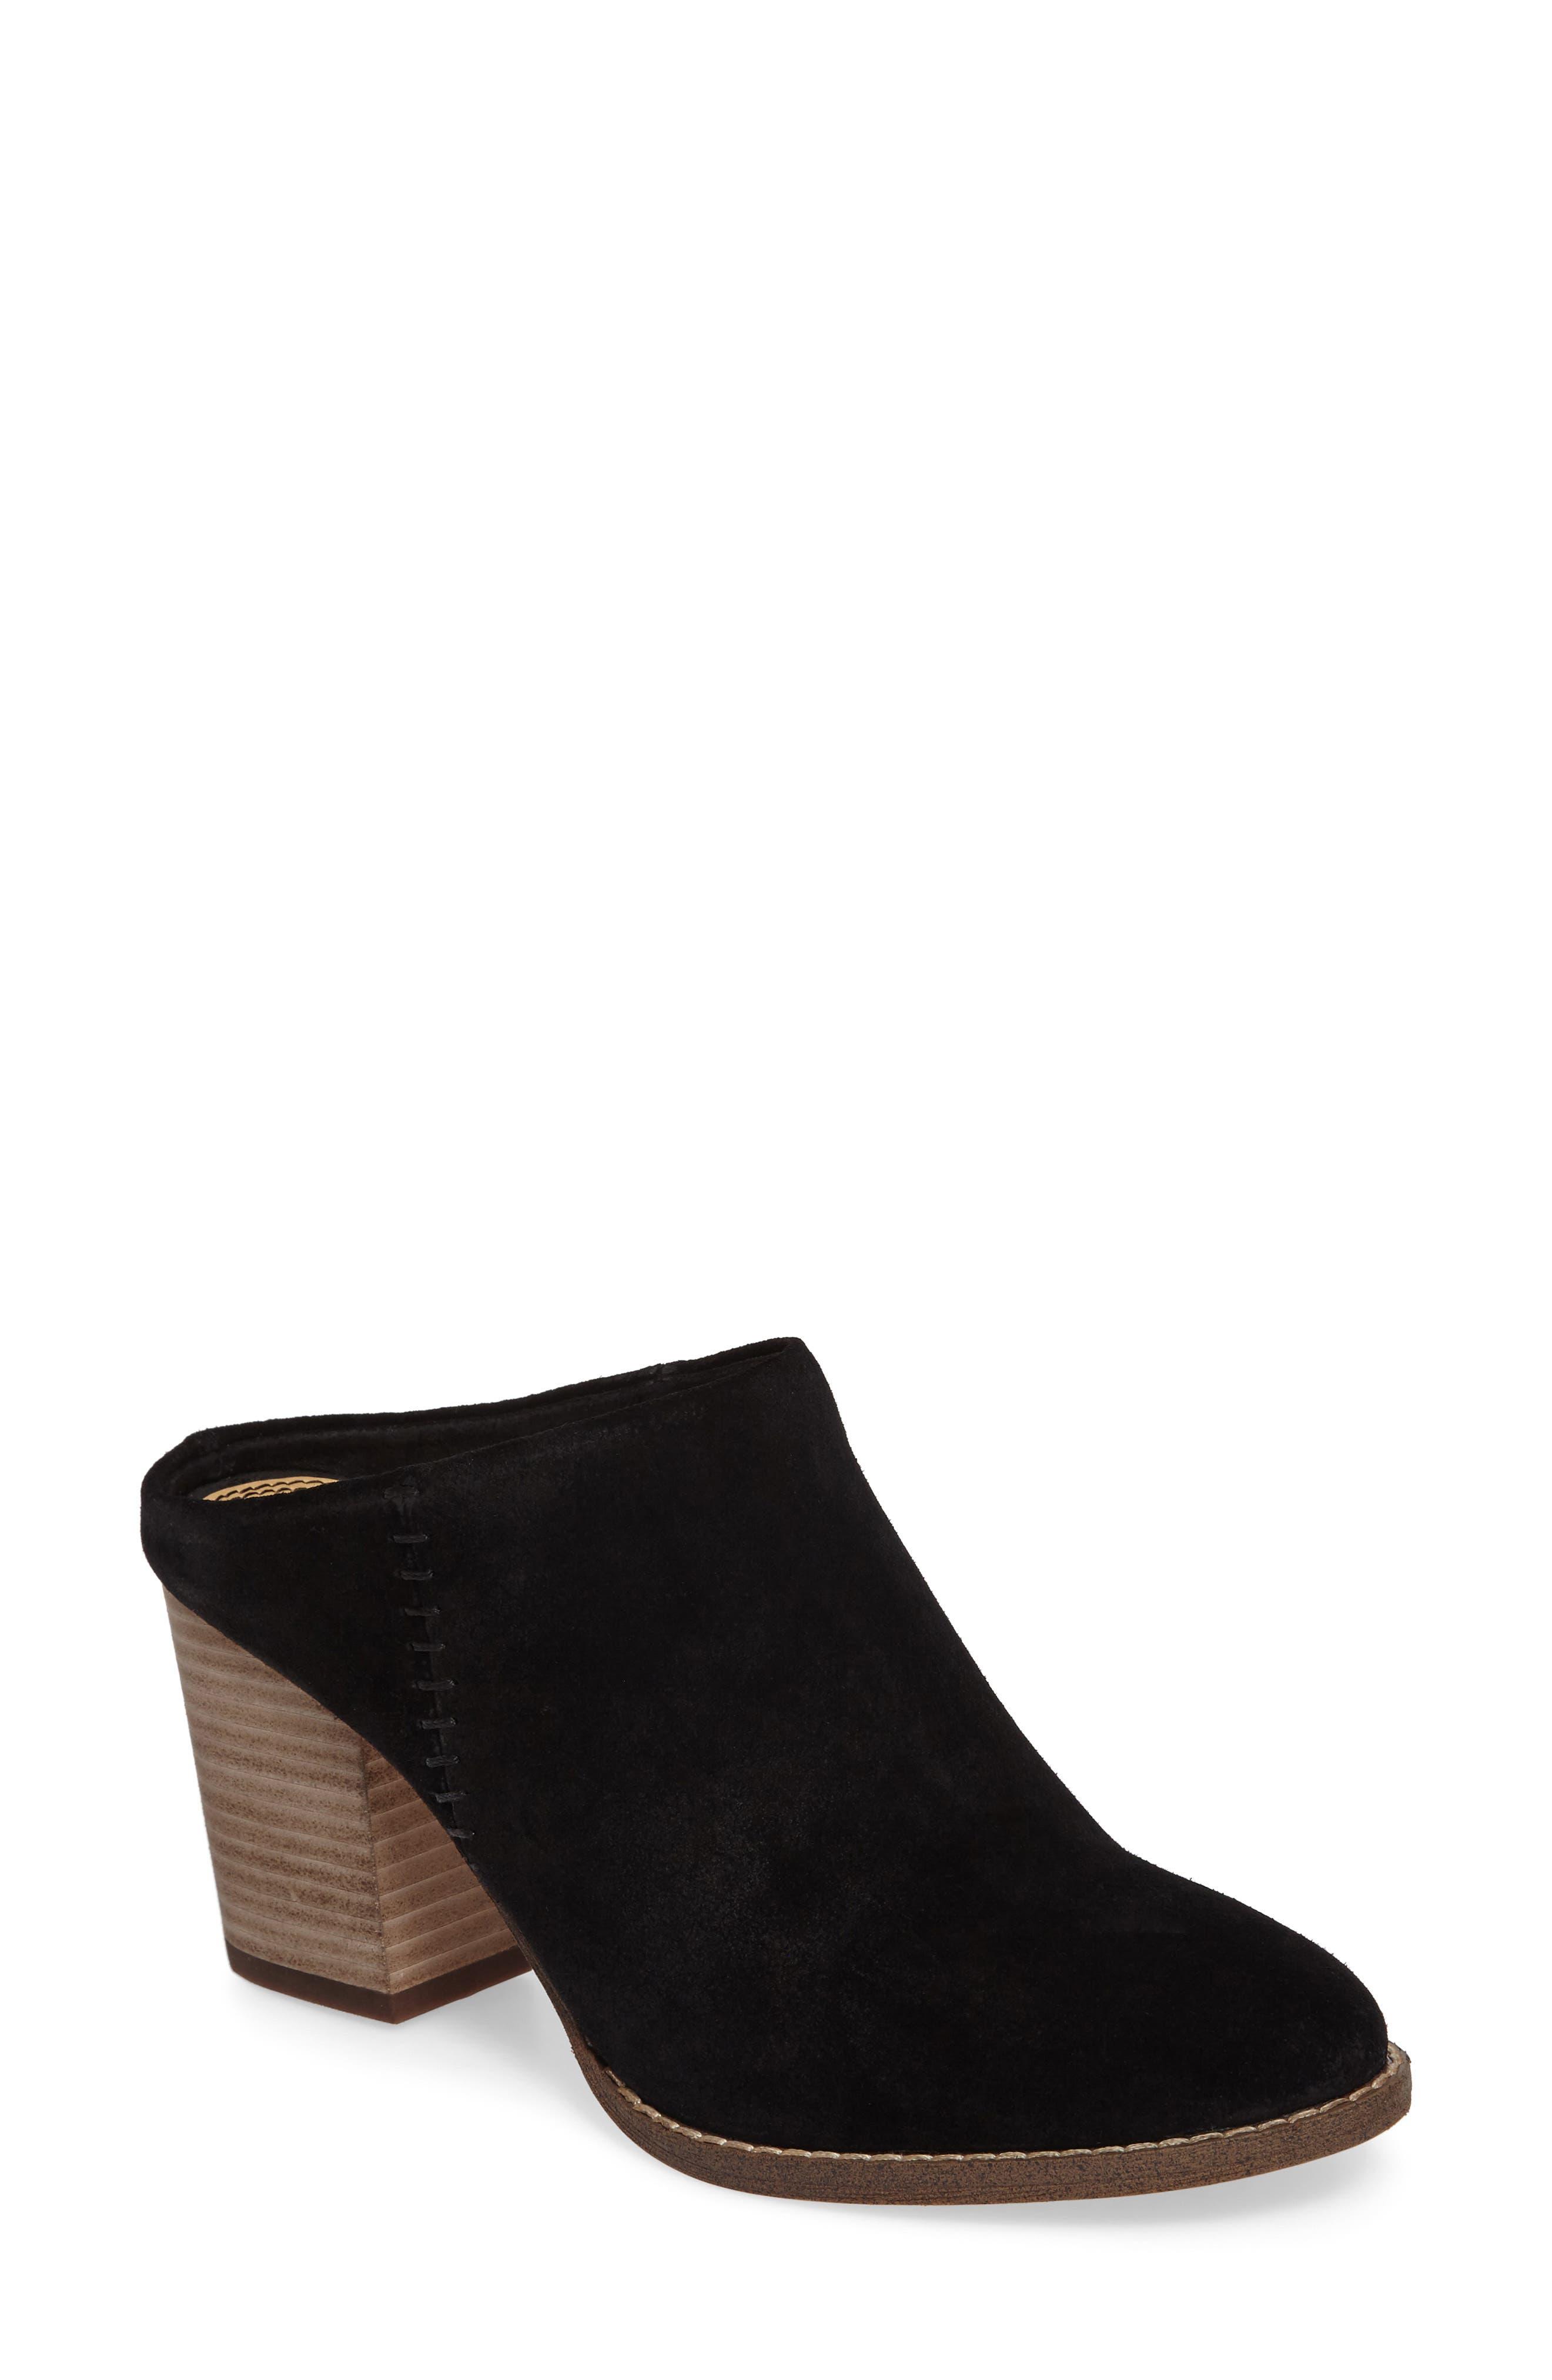 Debrah Block Heel Mule,                         Main,                         color, Black Suede